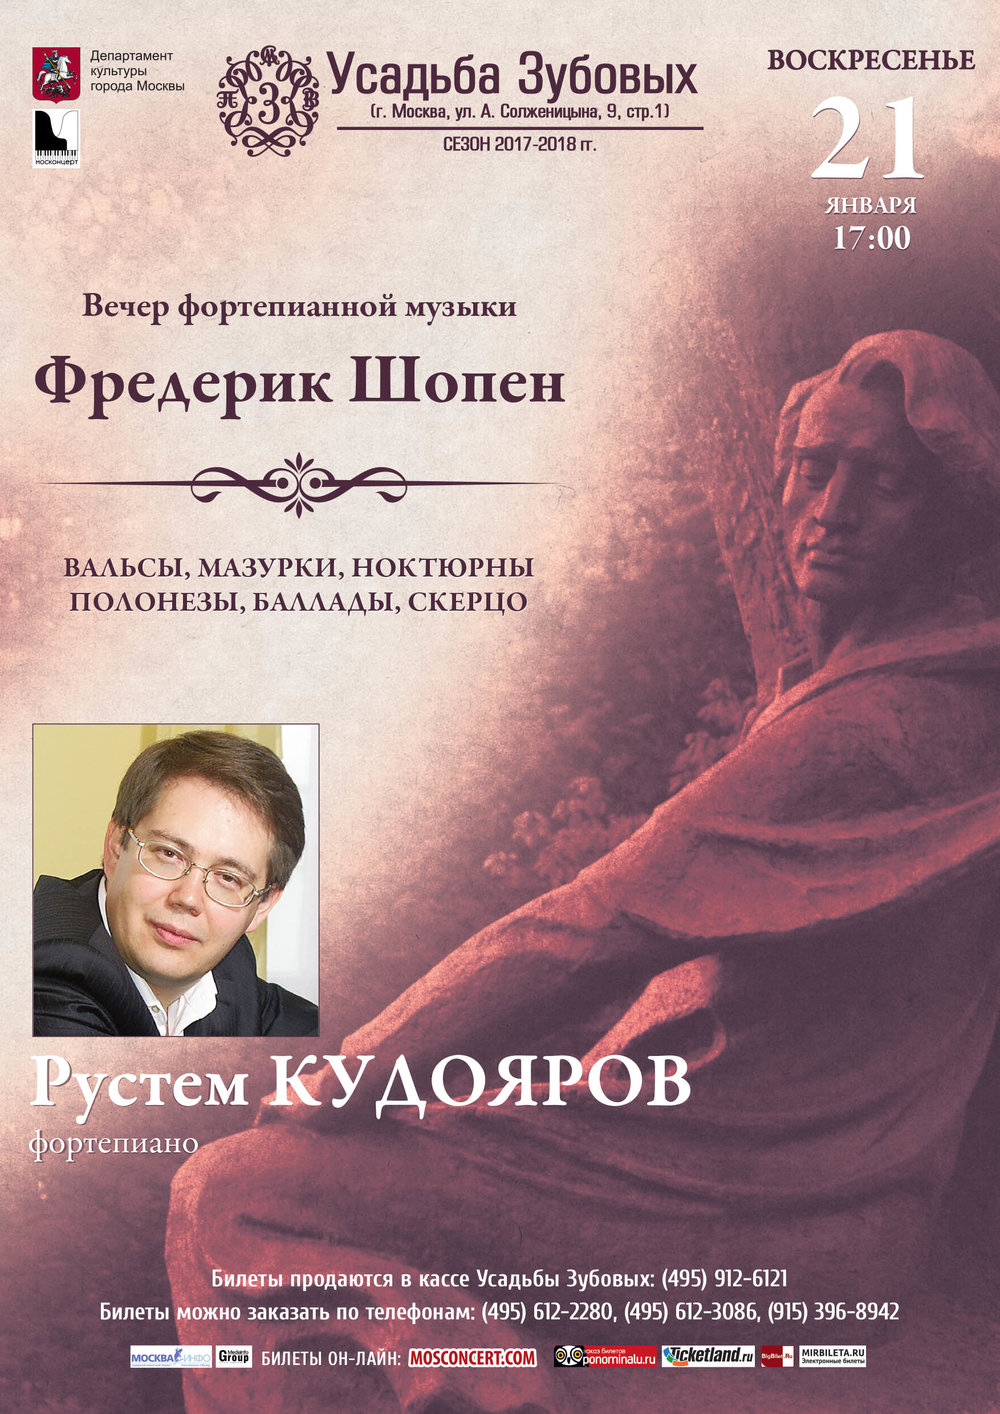 КФО_21.01.18_Шопен_proba_04.jpg